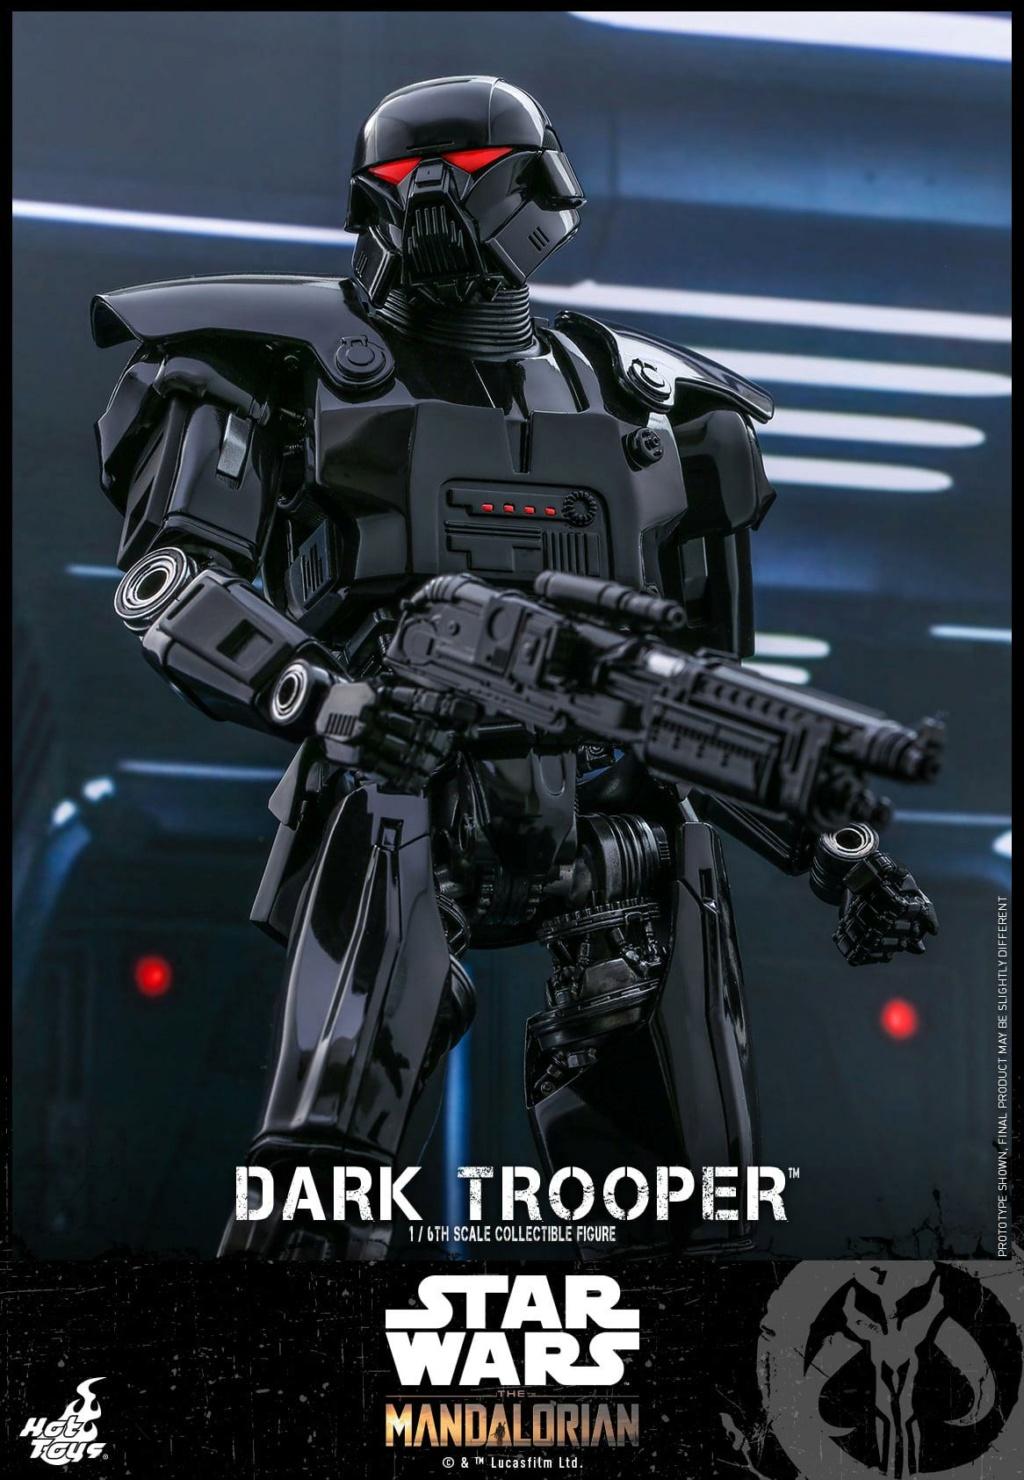 Dark Trooper Collectible Figure - 1/6th scale - Hot Toys Dark_t17